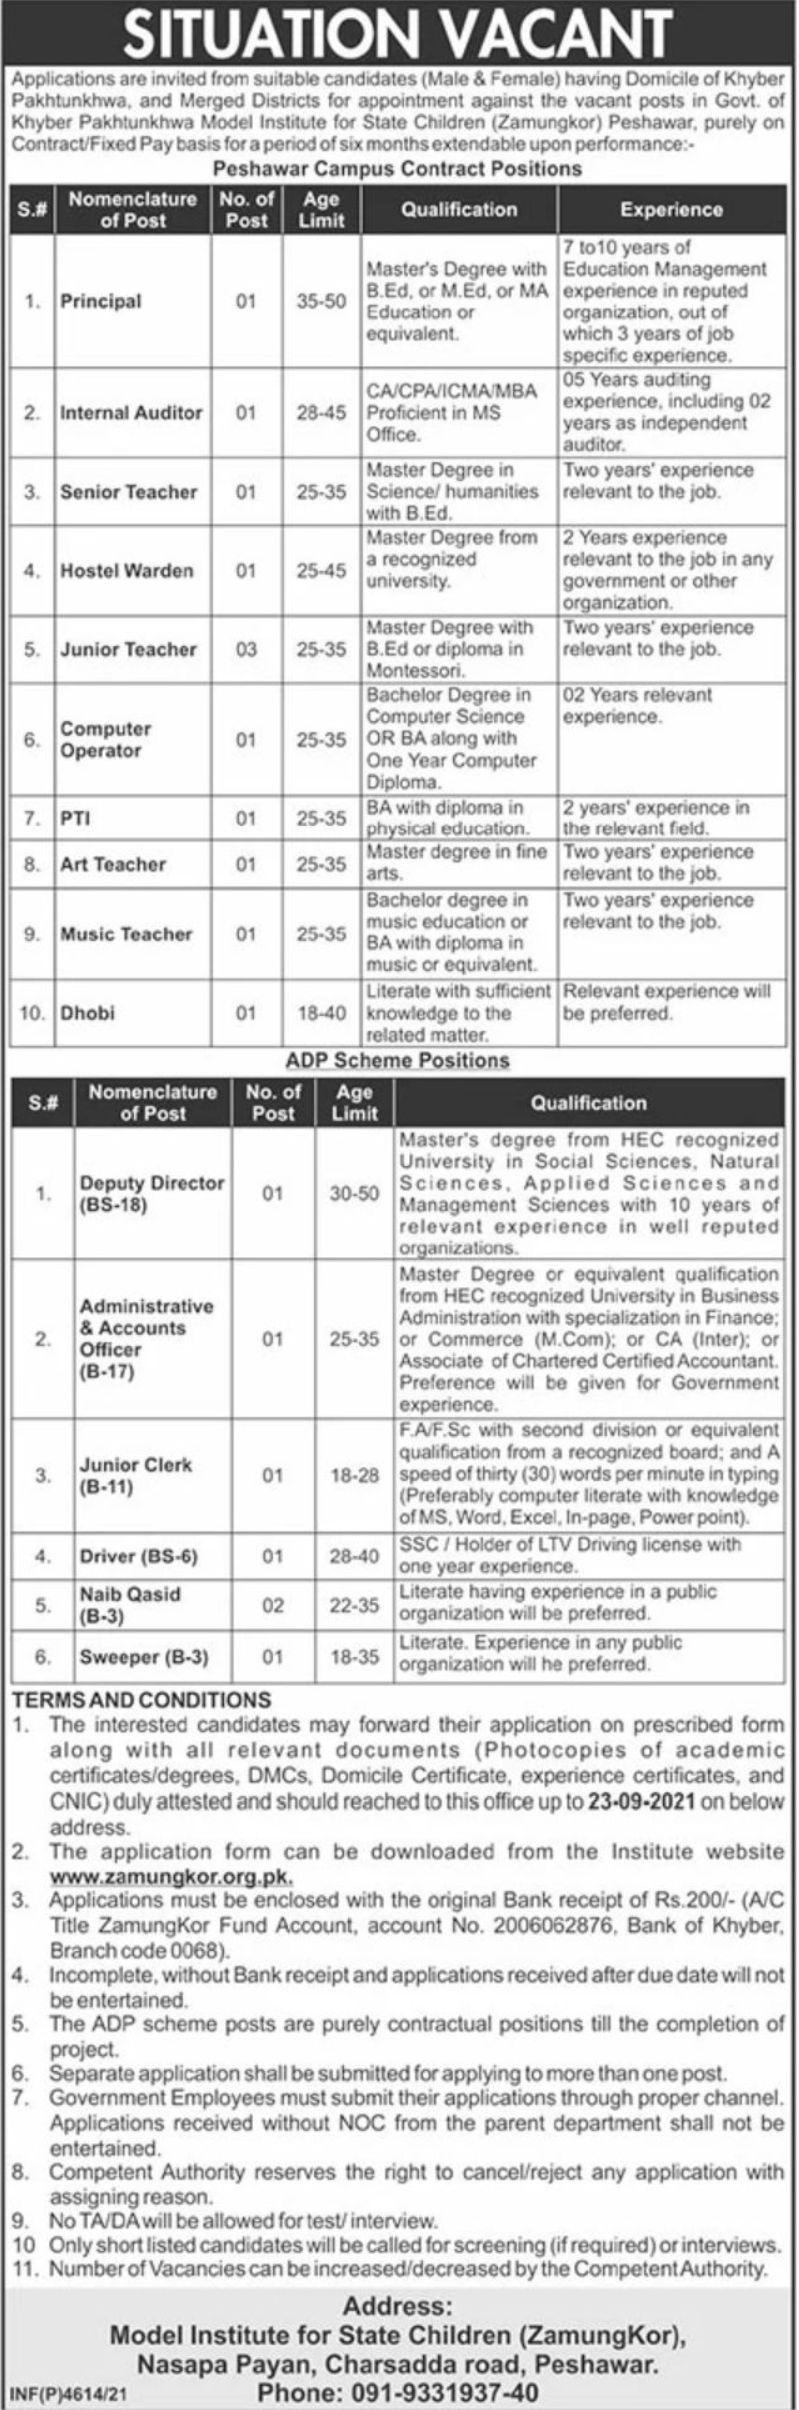 Model Institute for State Children Vacancies 2021 3